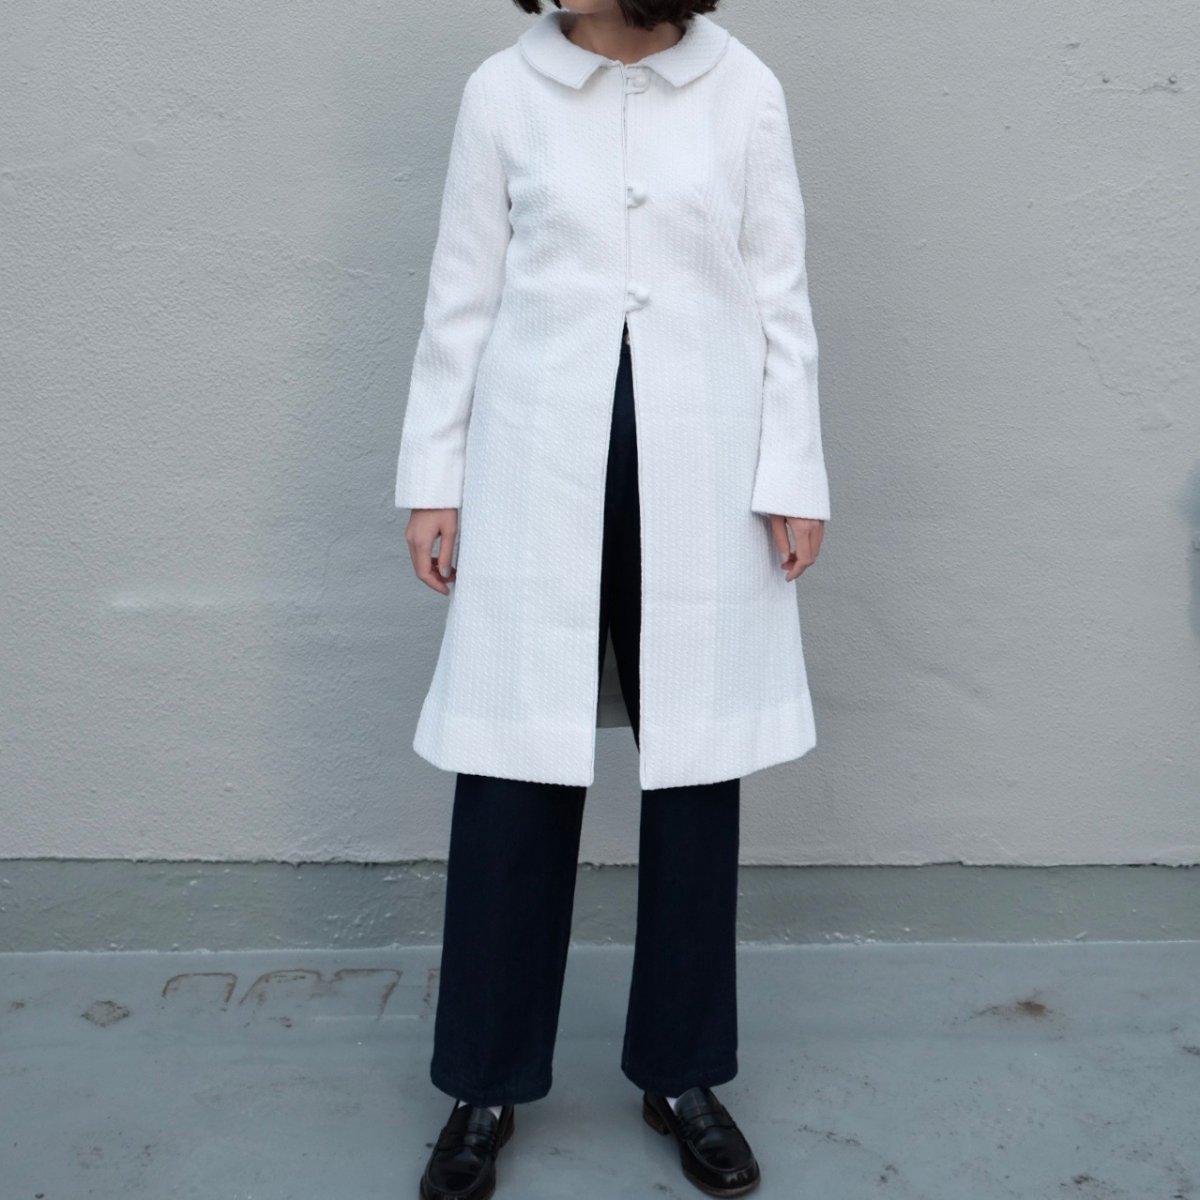 Snow white ribbed spring coat